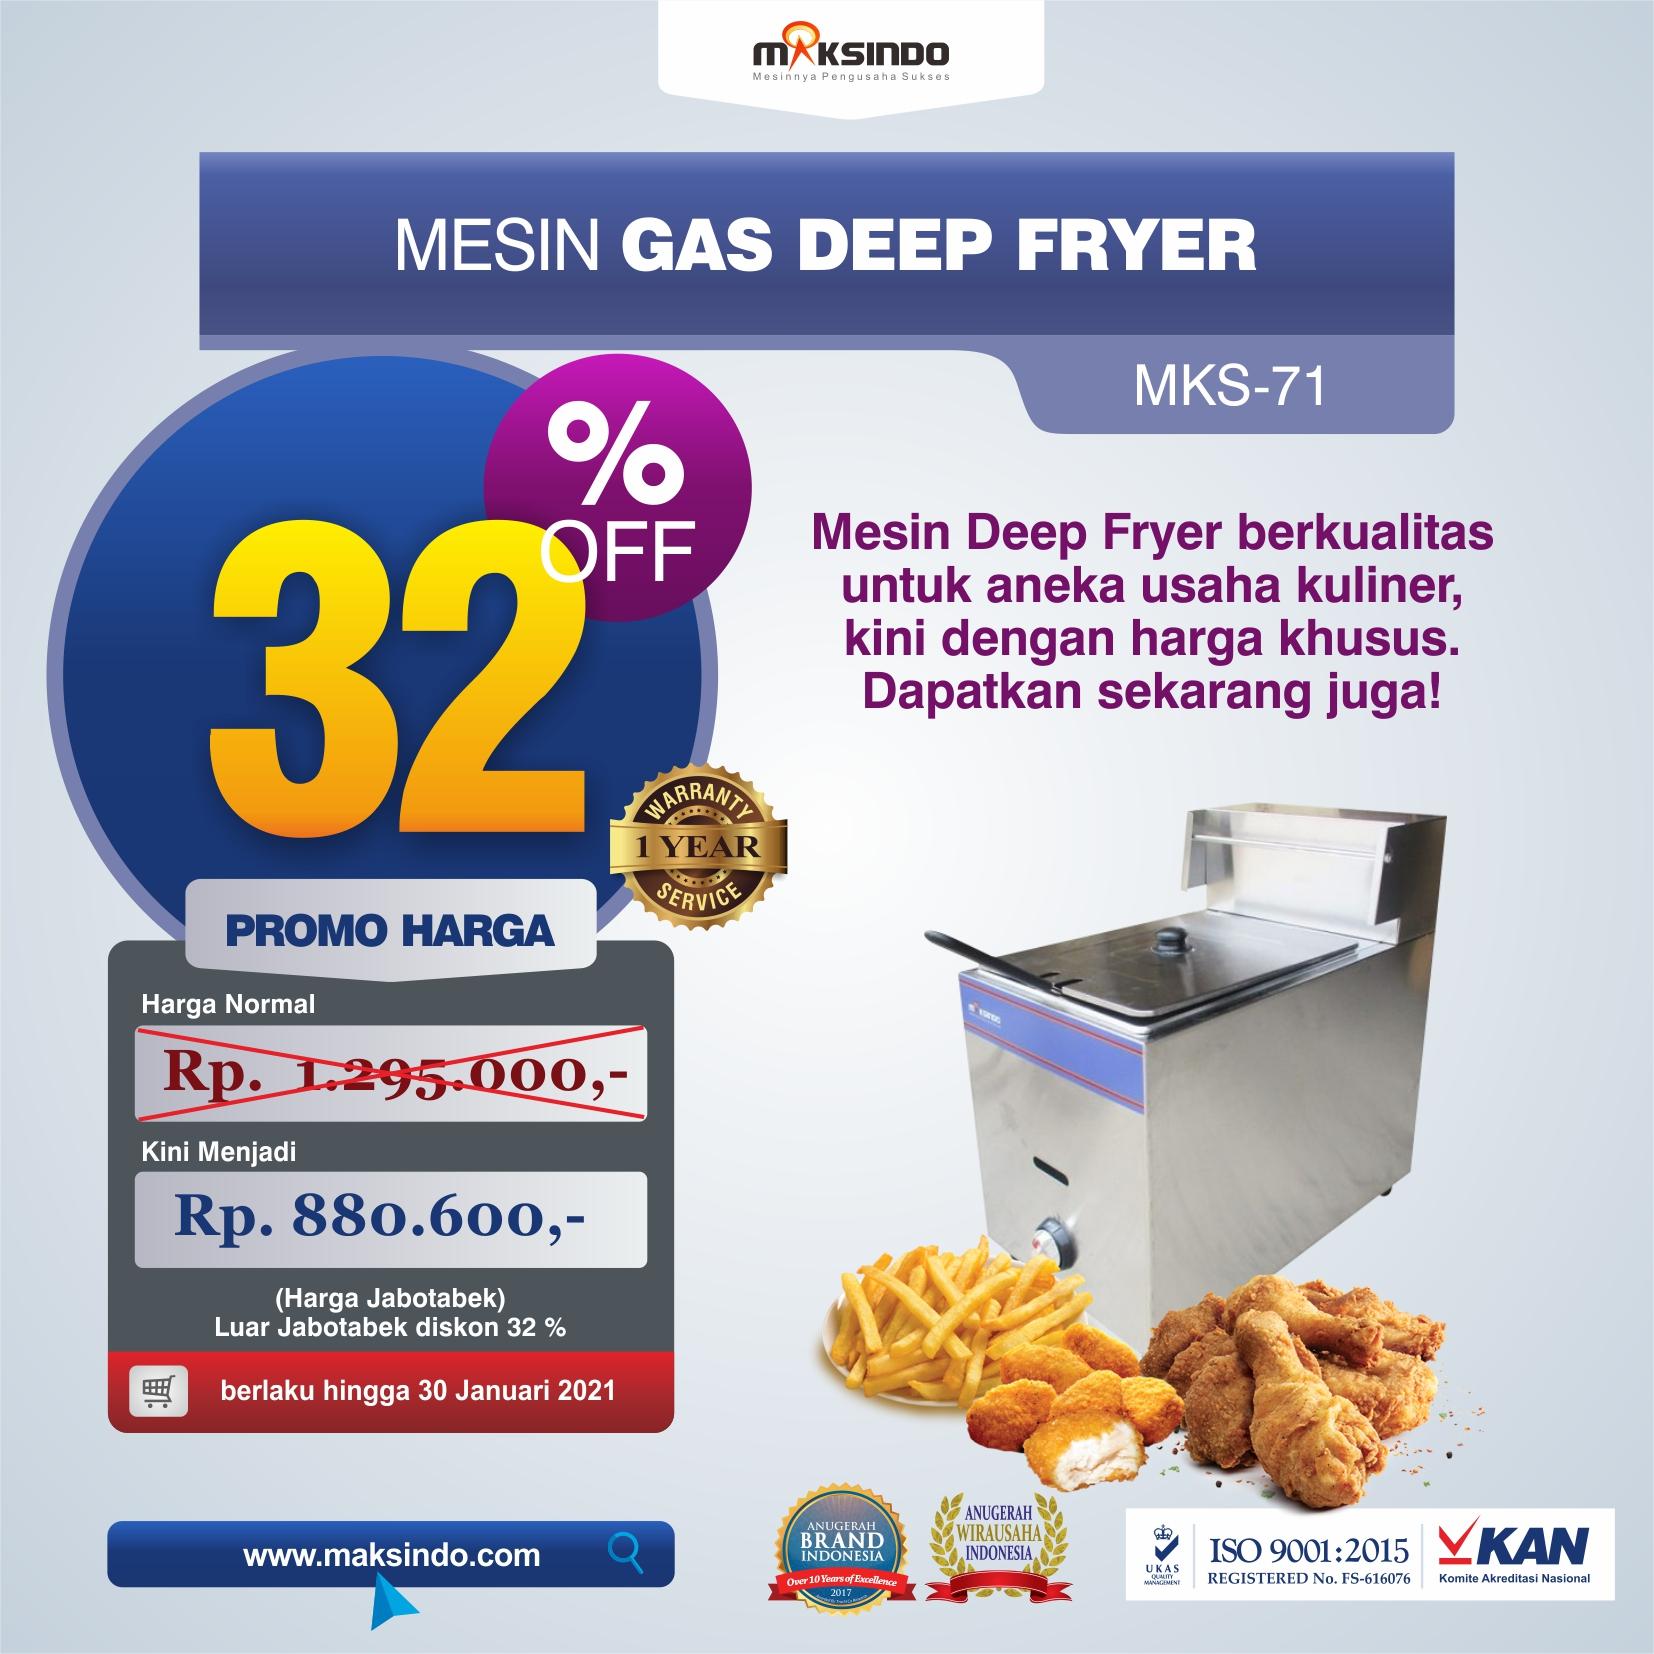 Mesin Gas Deep Fryer MKS-71